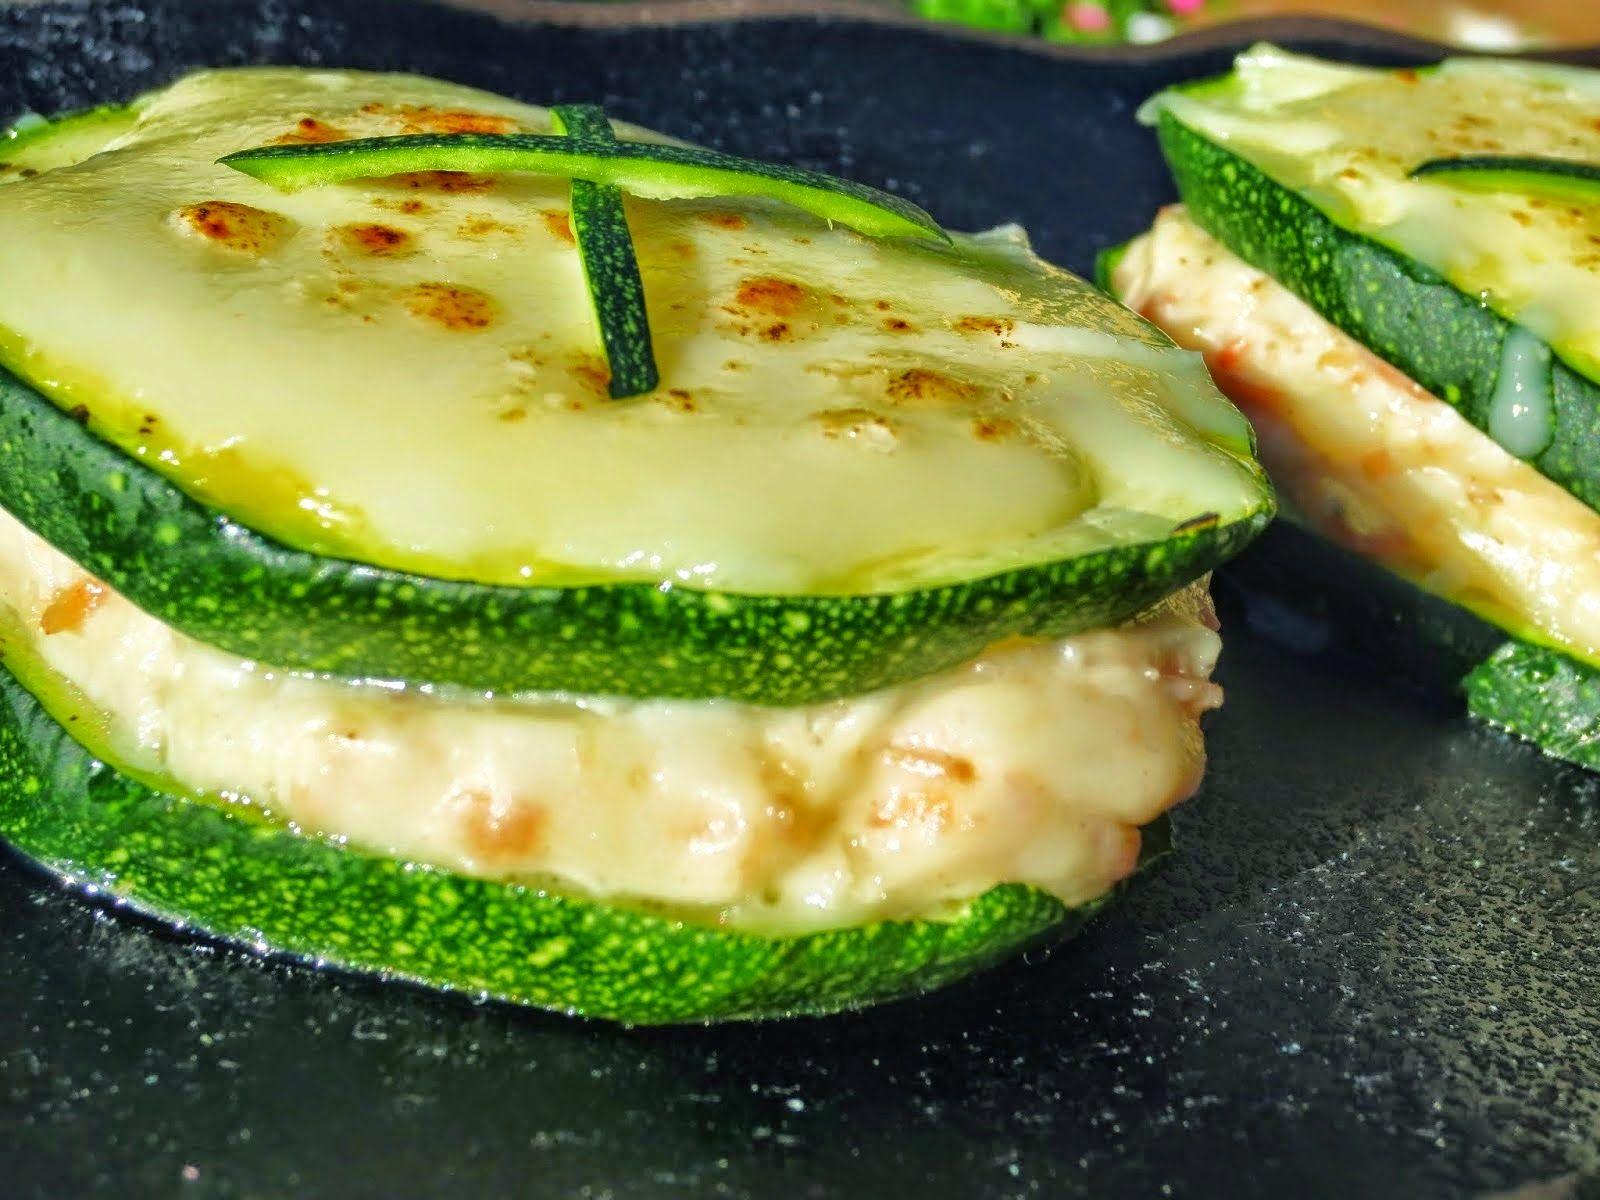 Sandwich de calabac n ana sevilla cocina tradicional errezetak en 2019 calabac n comida y - Ana cocina facil ...